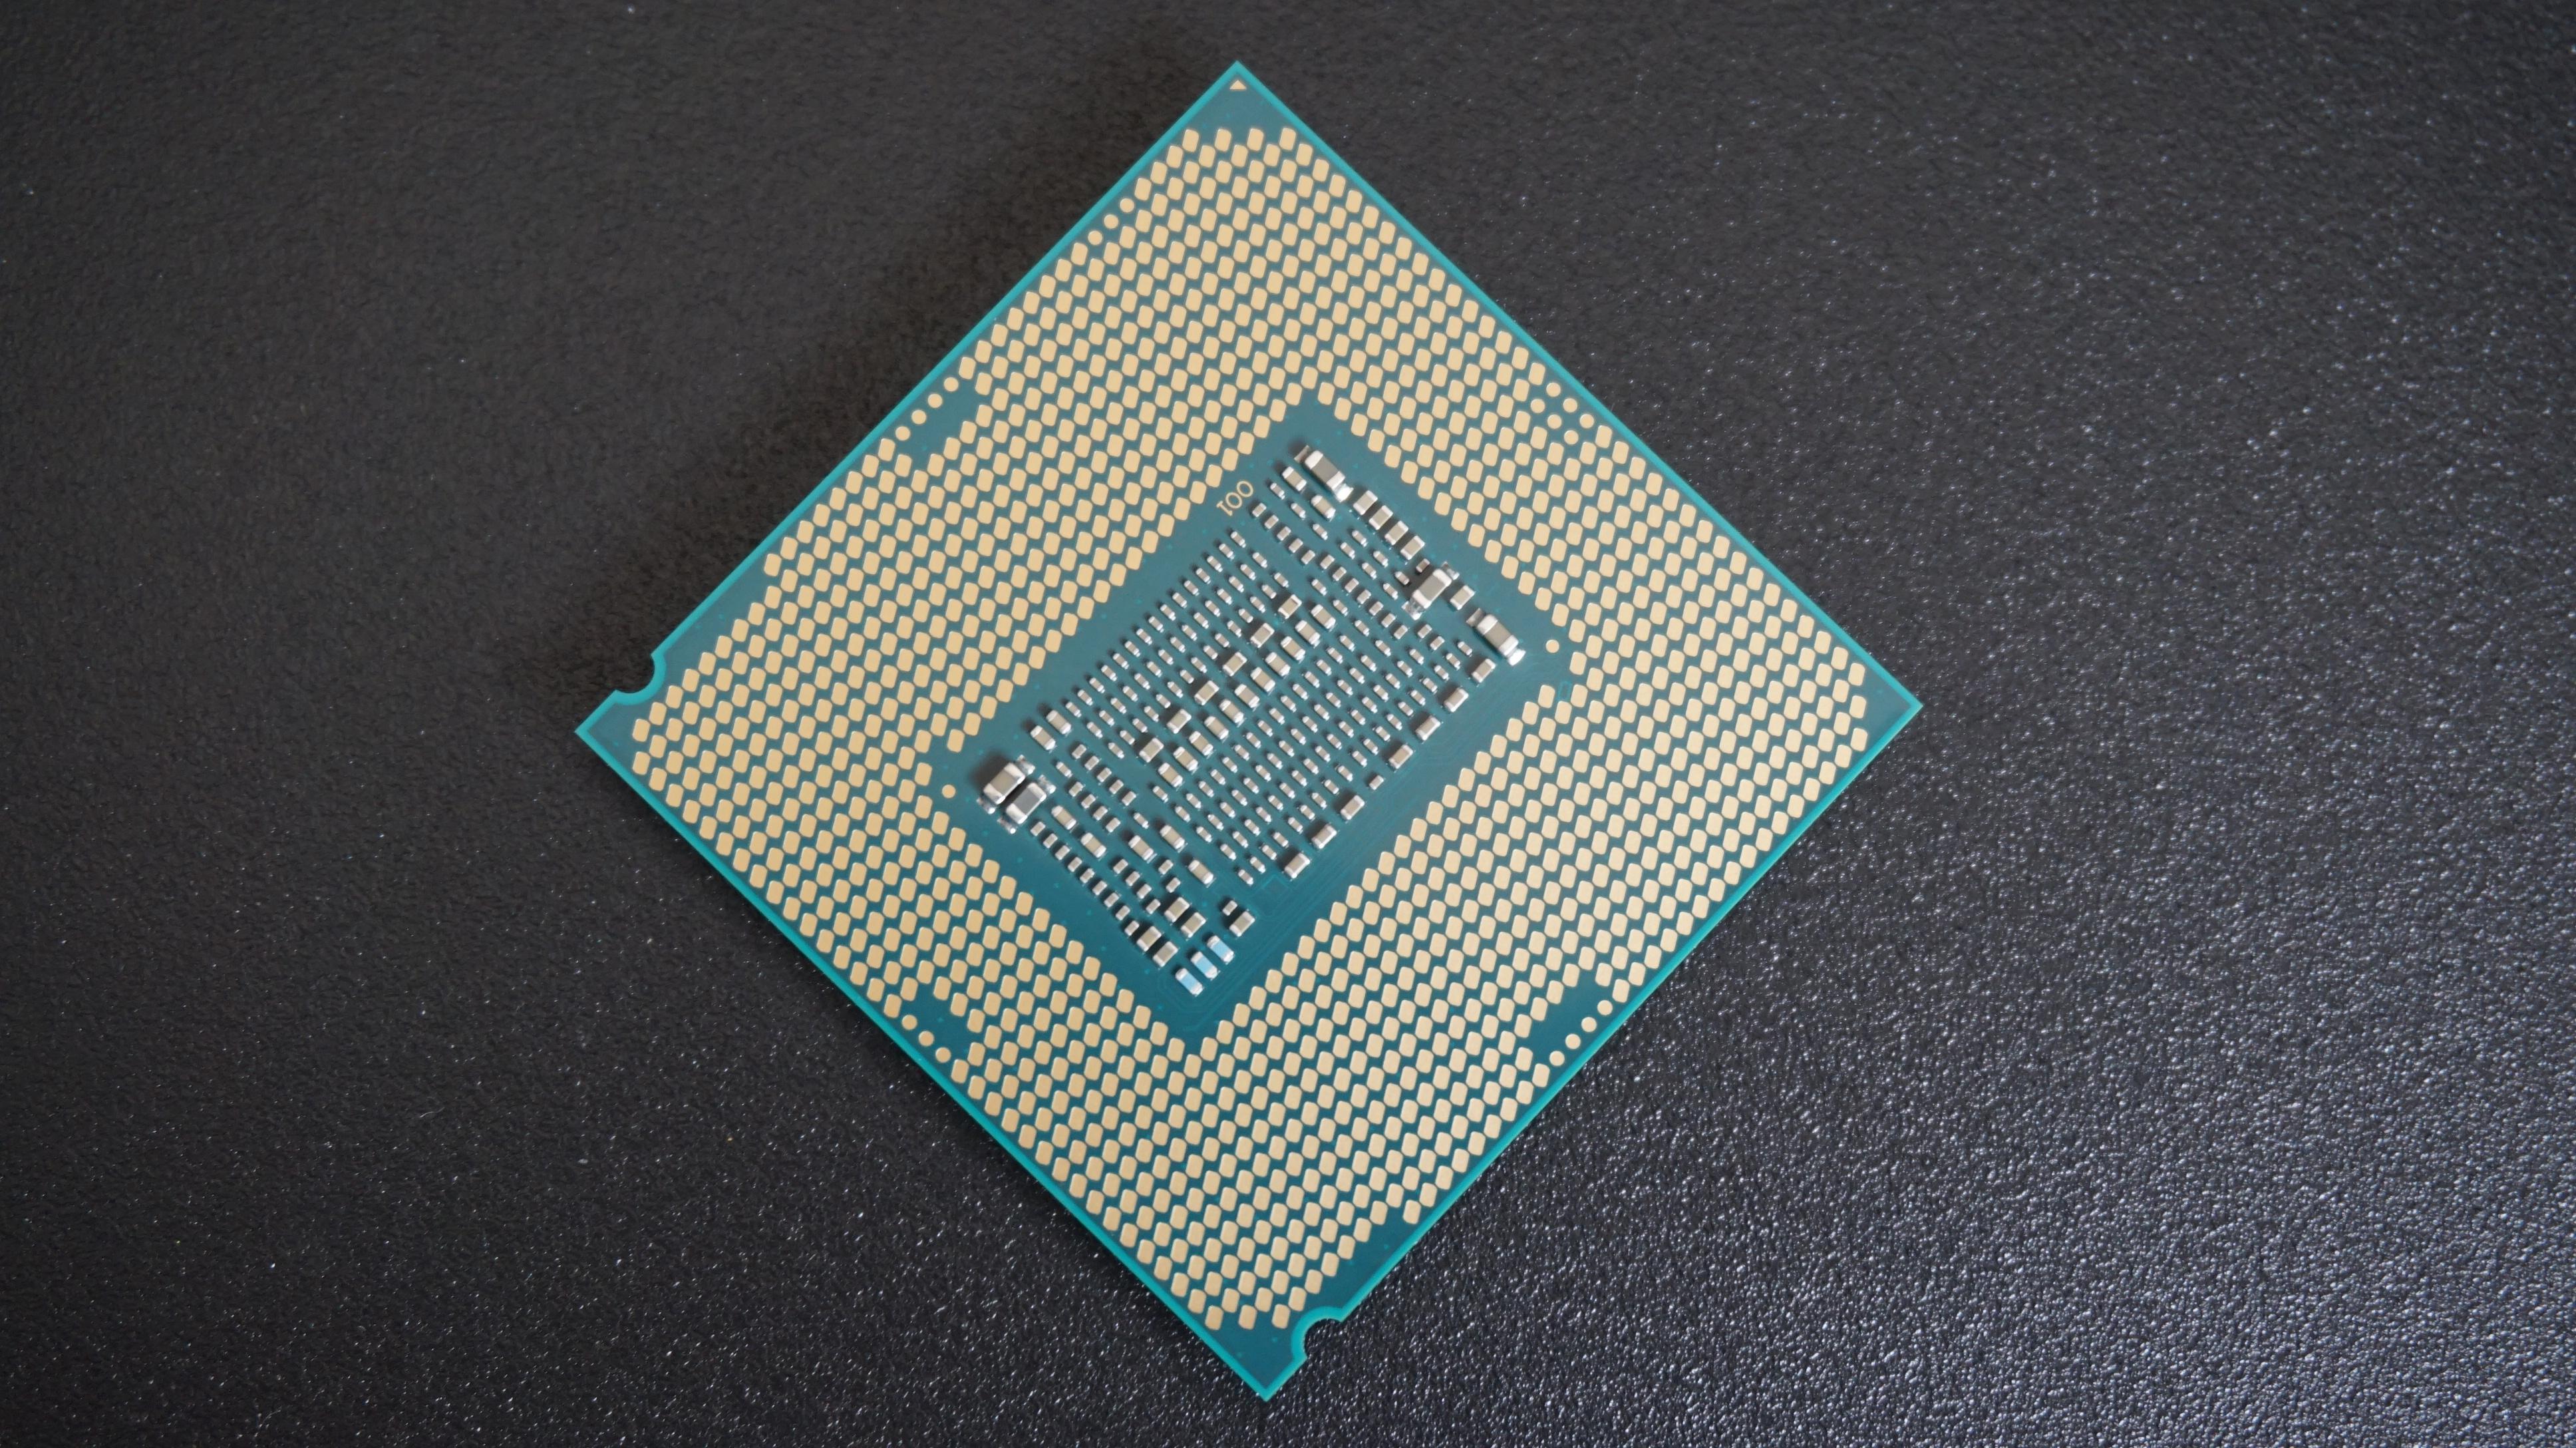 Intel Core i5-8600K review: No longer the best mid-range